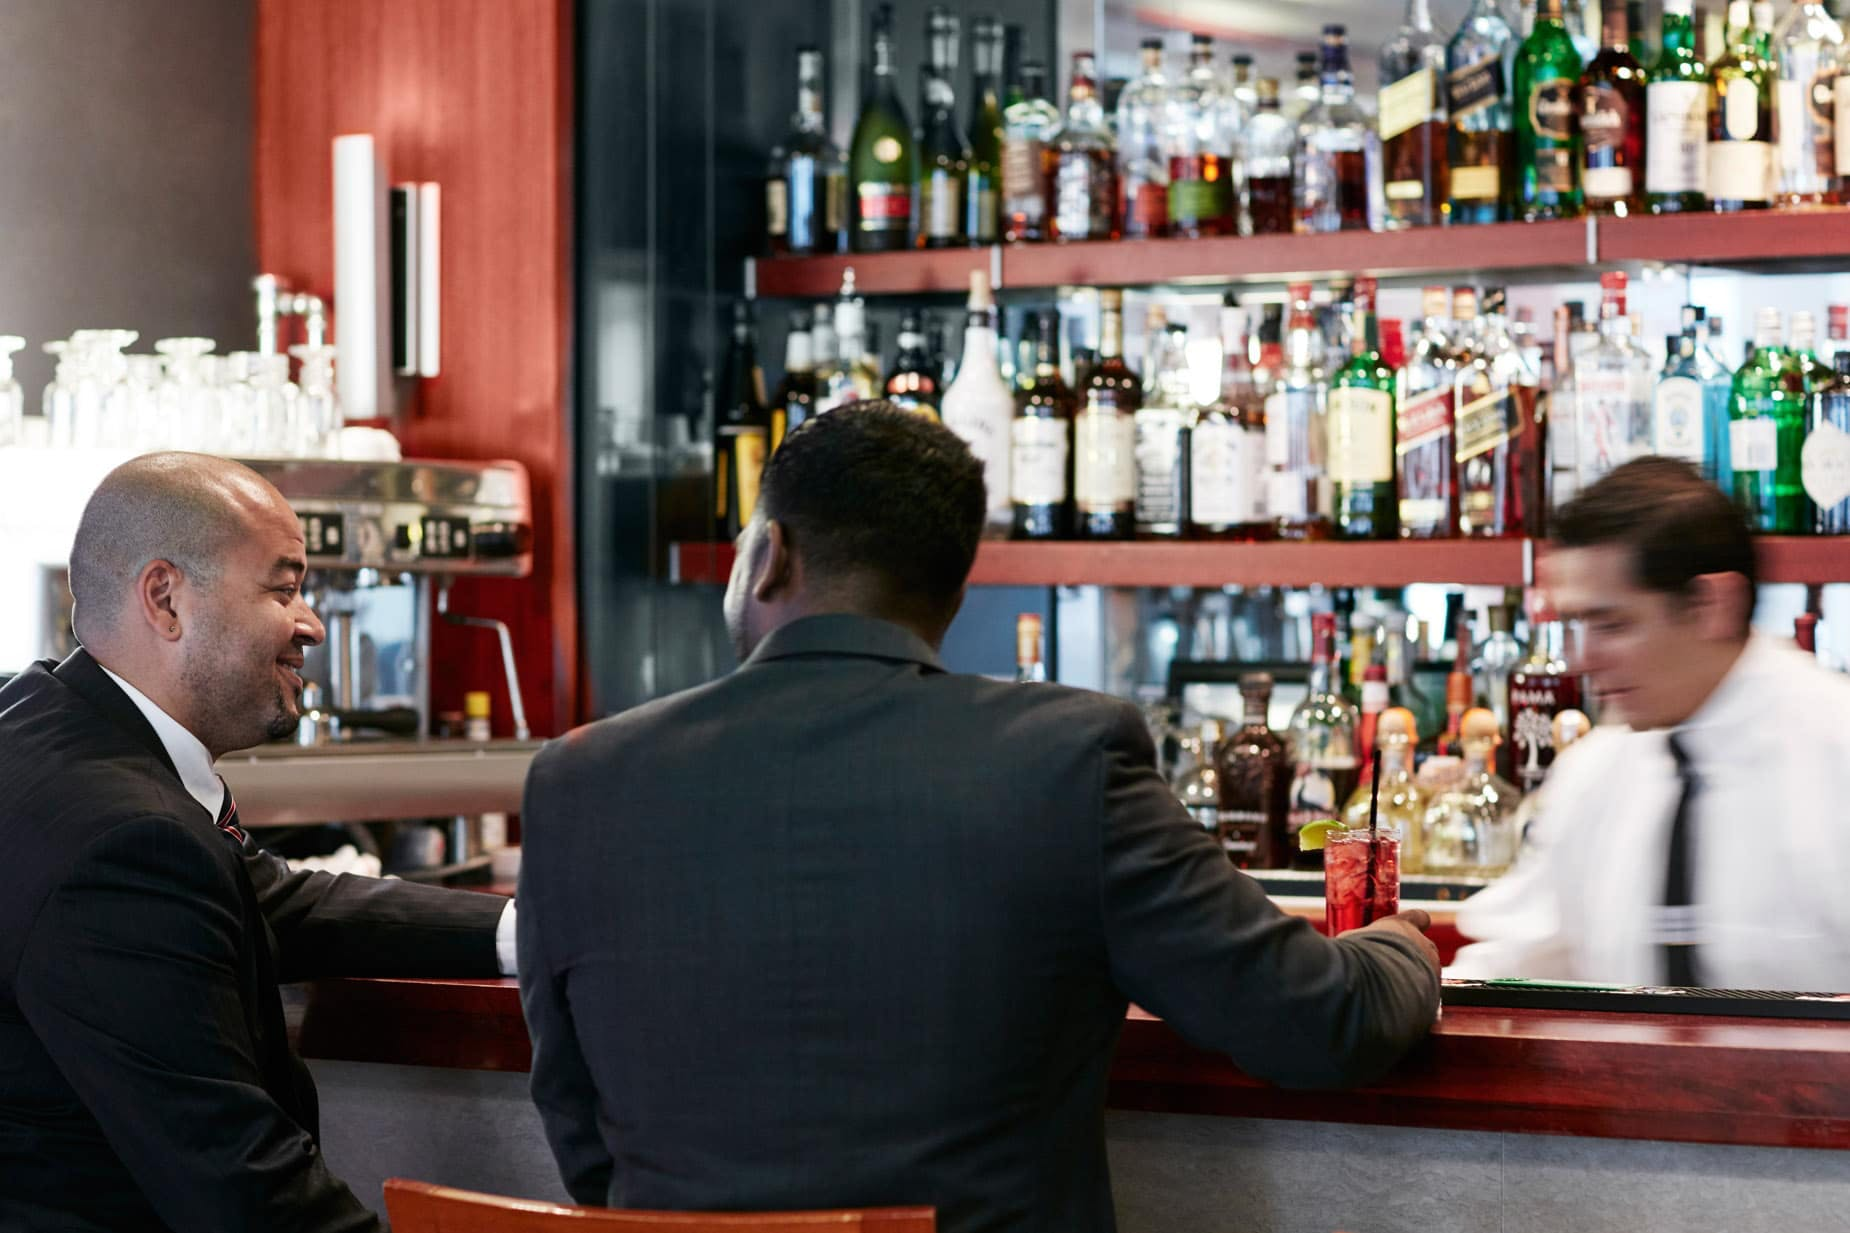 The Terrace Club Bar at Club Quarters Hotel, opposite Rockefeller Center